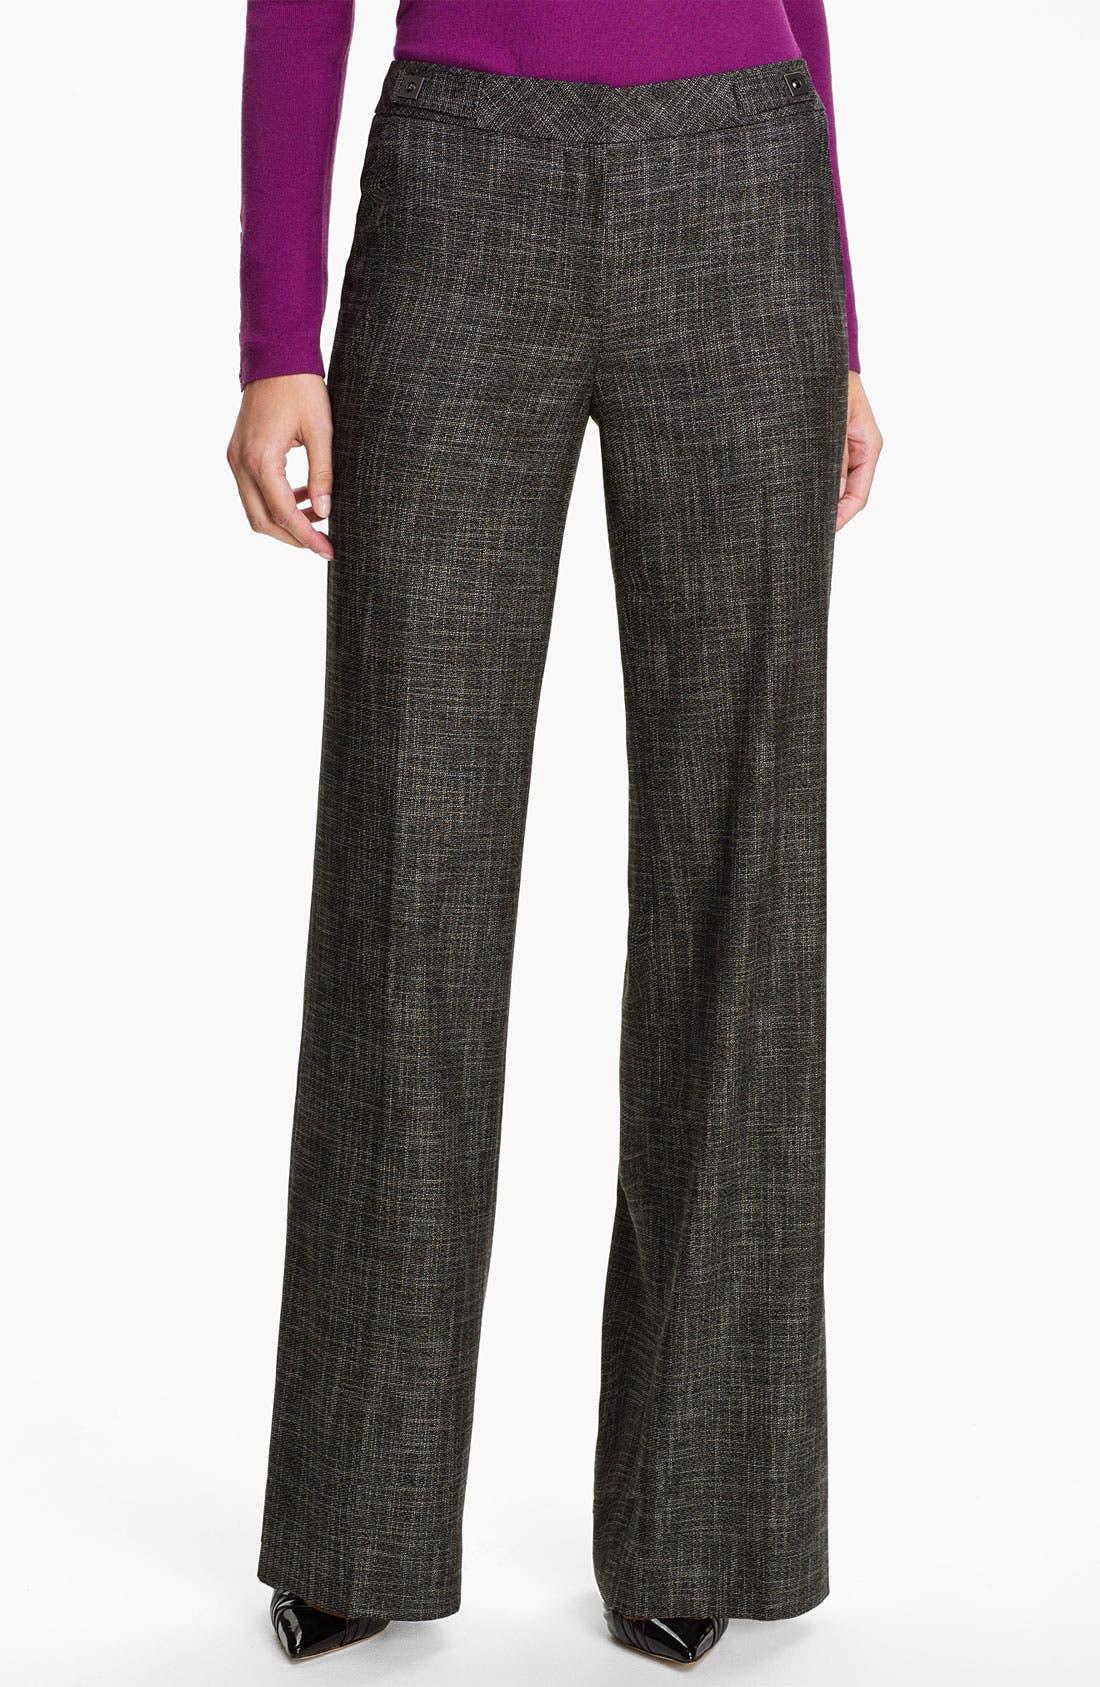 Alternate Image 1 Selected - Classiques Entier® 'Mystero Weave' Pants